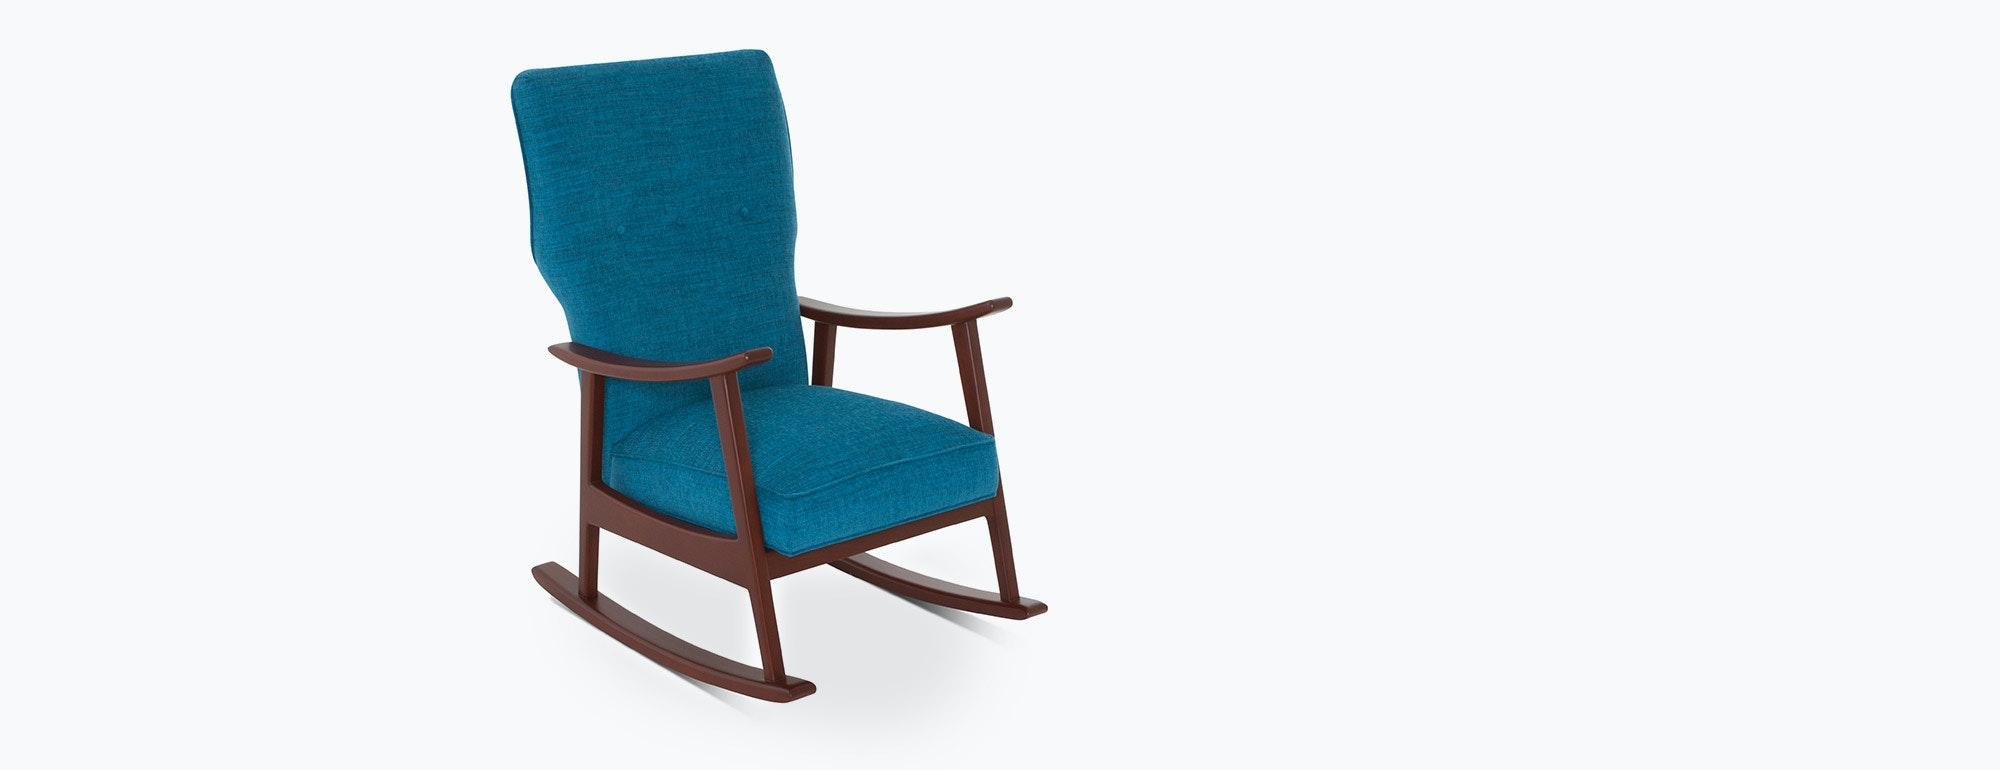 Pleasant Keyser Rocking Chair Lamtechconsult Wood Chair Design Ideas Lamtechconsultcom